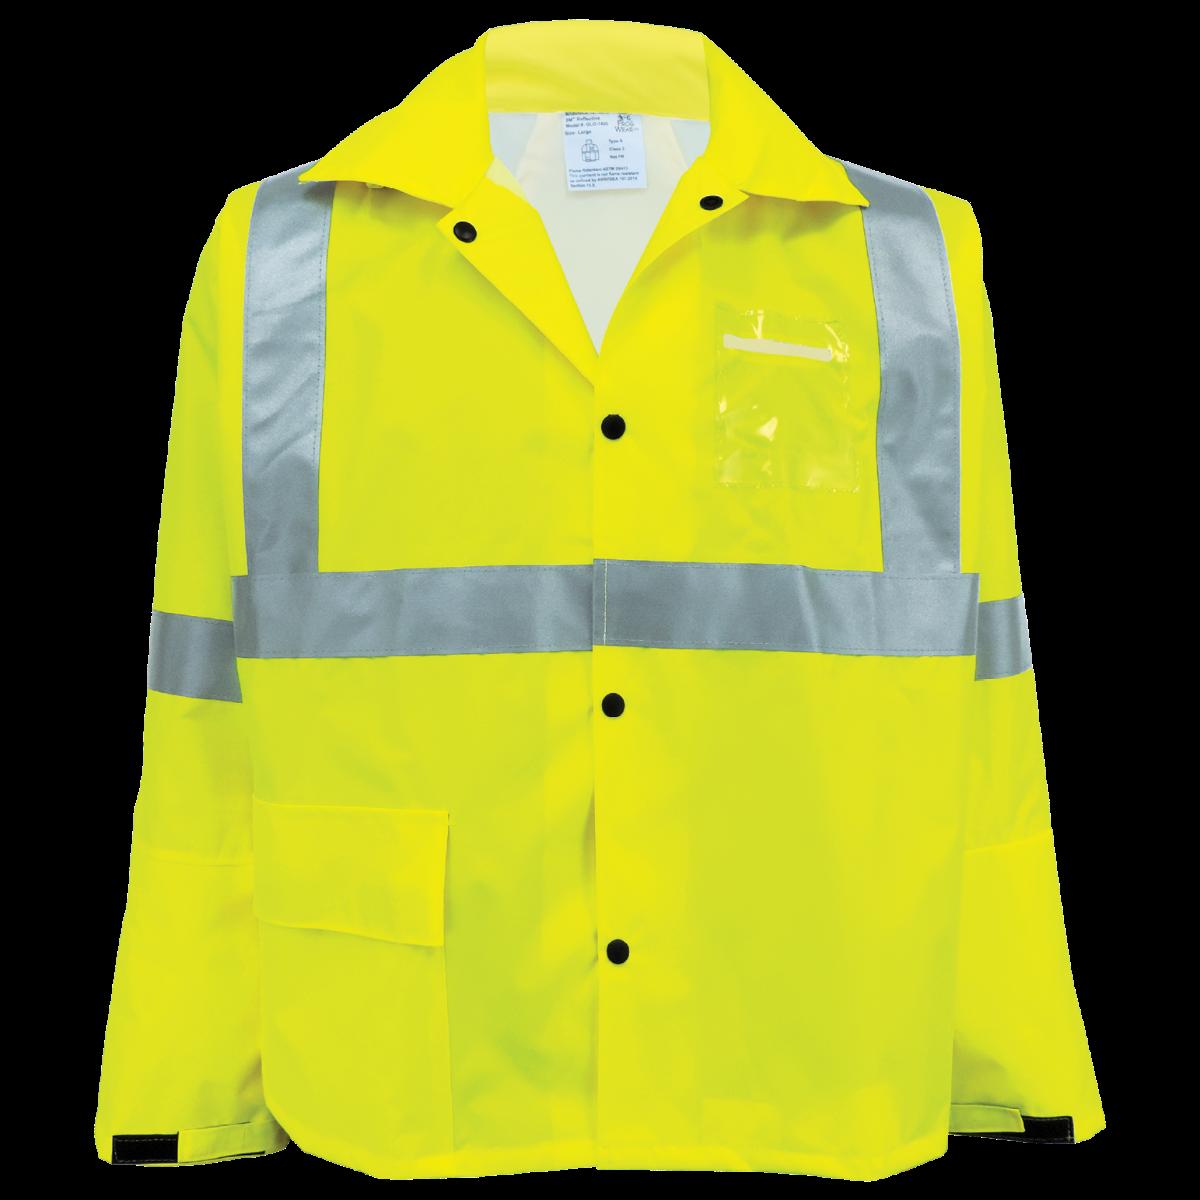 GLO-1400 - FrogWear HV - High-Visibility Yellow/Green Rain Jacket